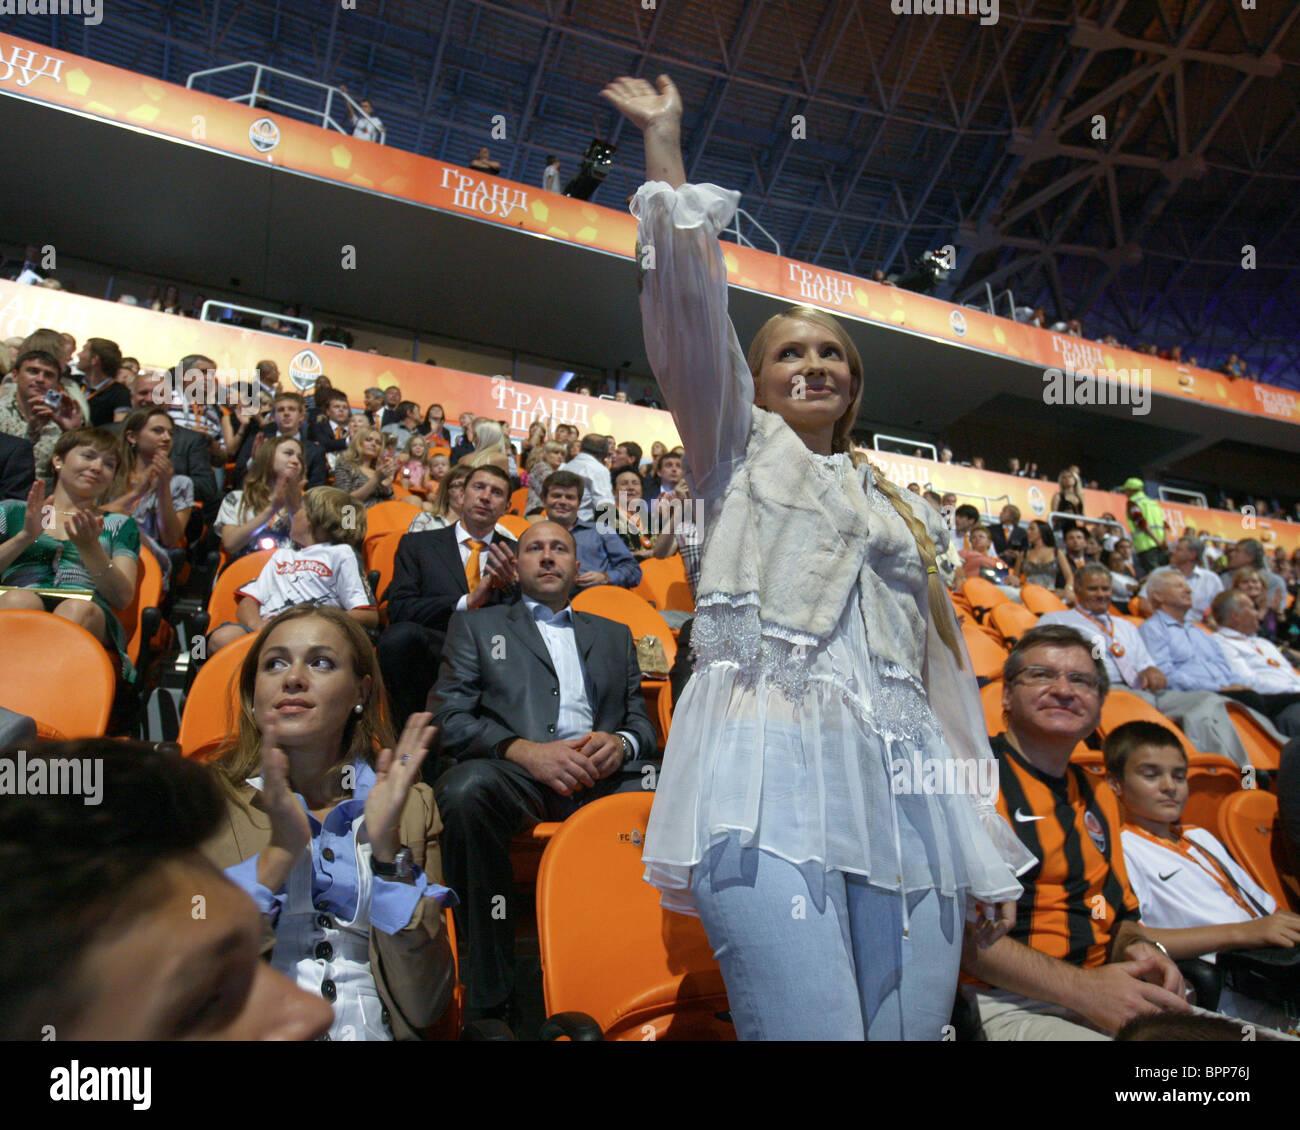 Donbass Arena inaugurated in Donetsk, Ukraine - Stock Image